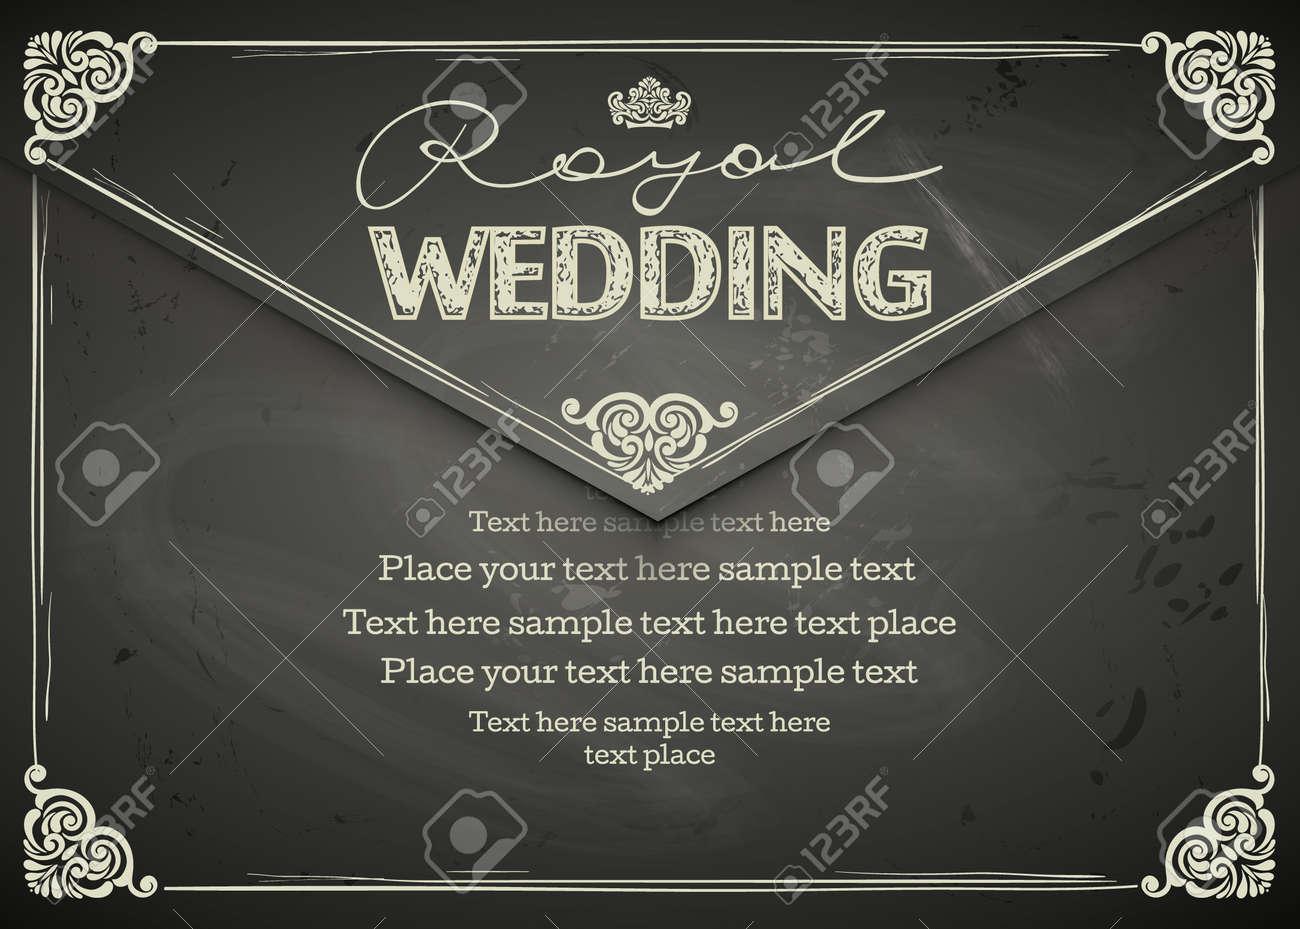 Vector   Vintage Wedding Frames And Border. Easy To Use. Chalkboard Design